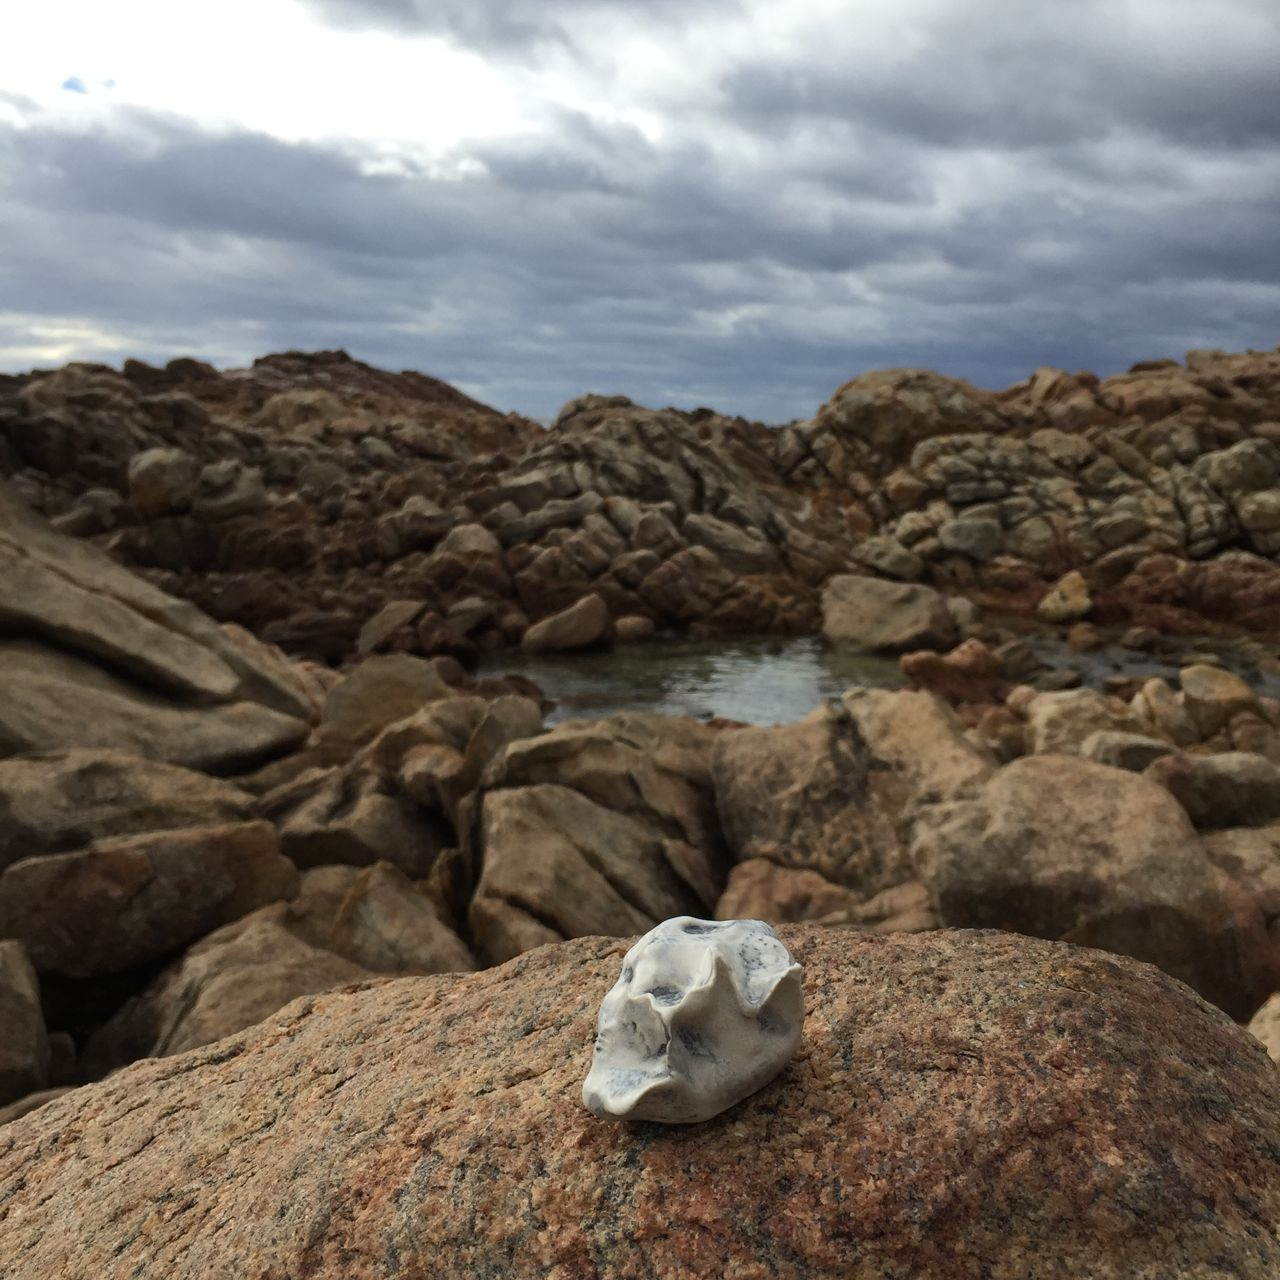 canal rocks . wa . australia 23.03.16